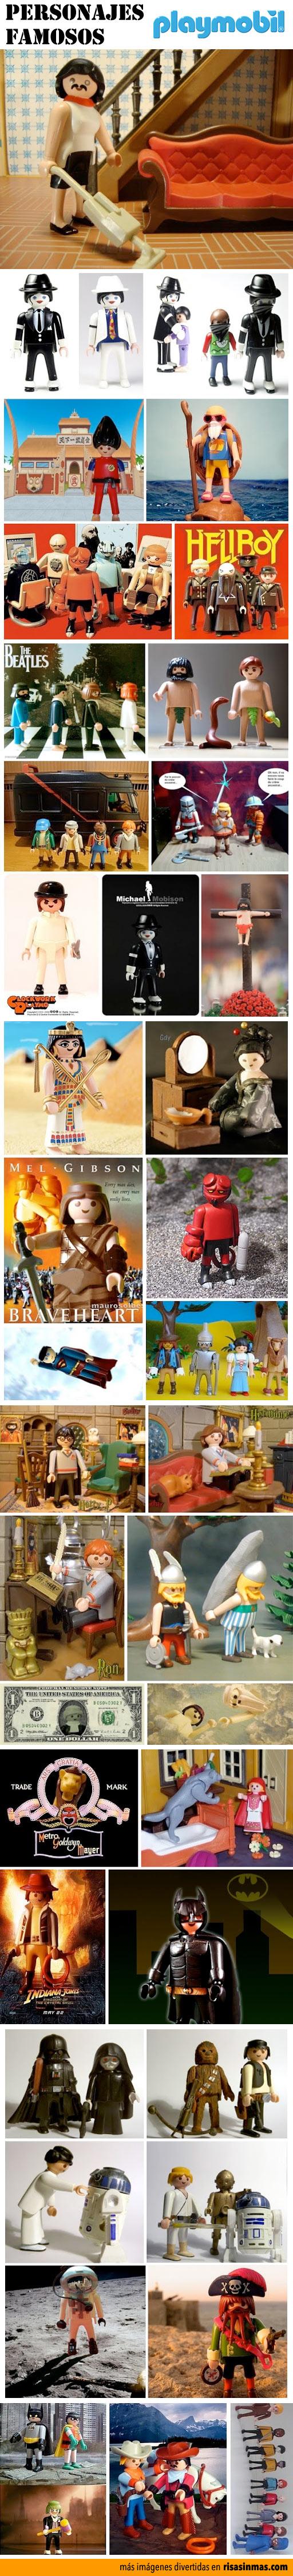 Personajes famosos versión Playmobil